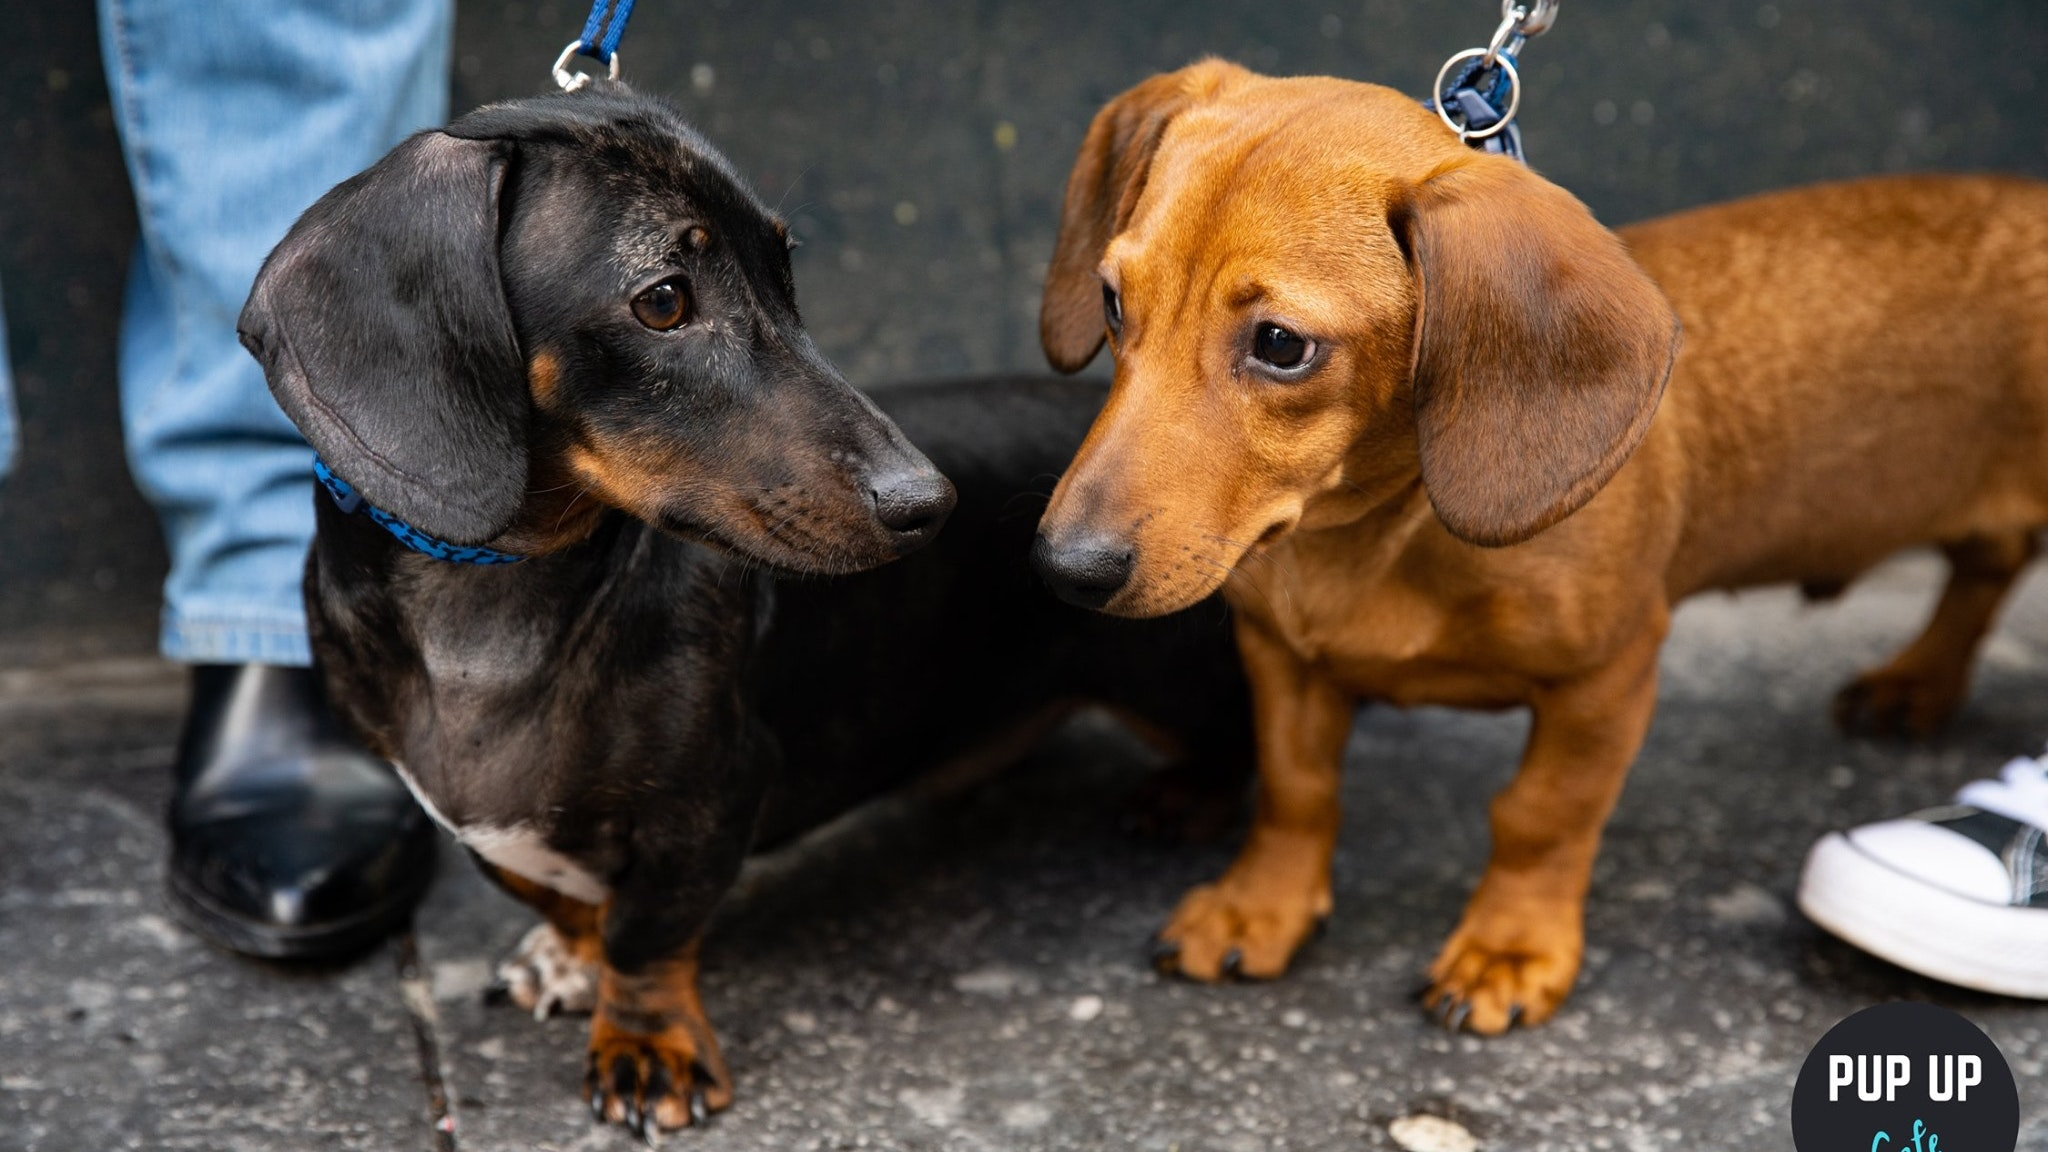 Dachshund Pup Up Cafe – Putney